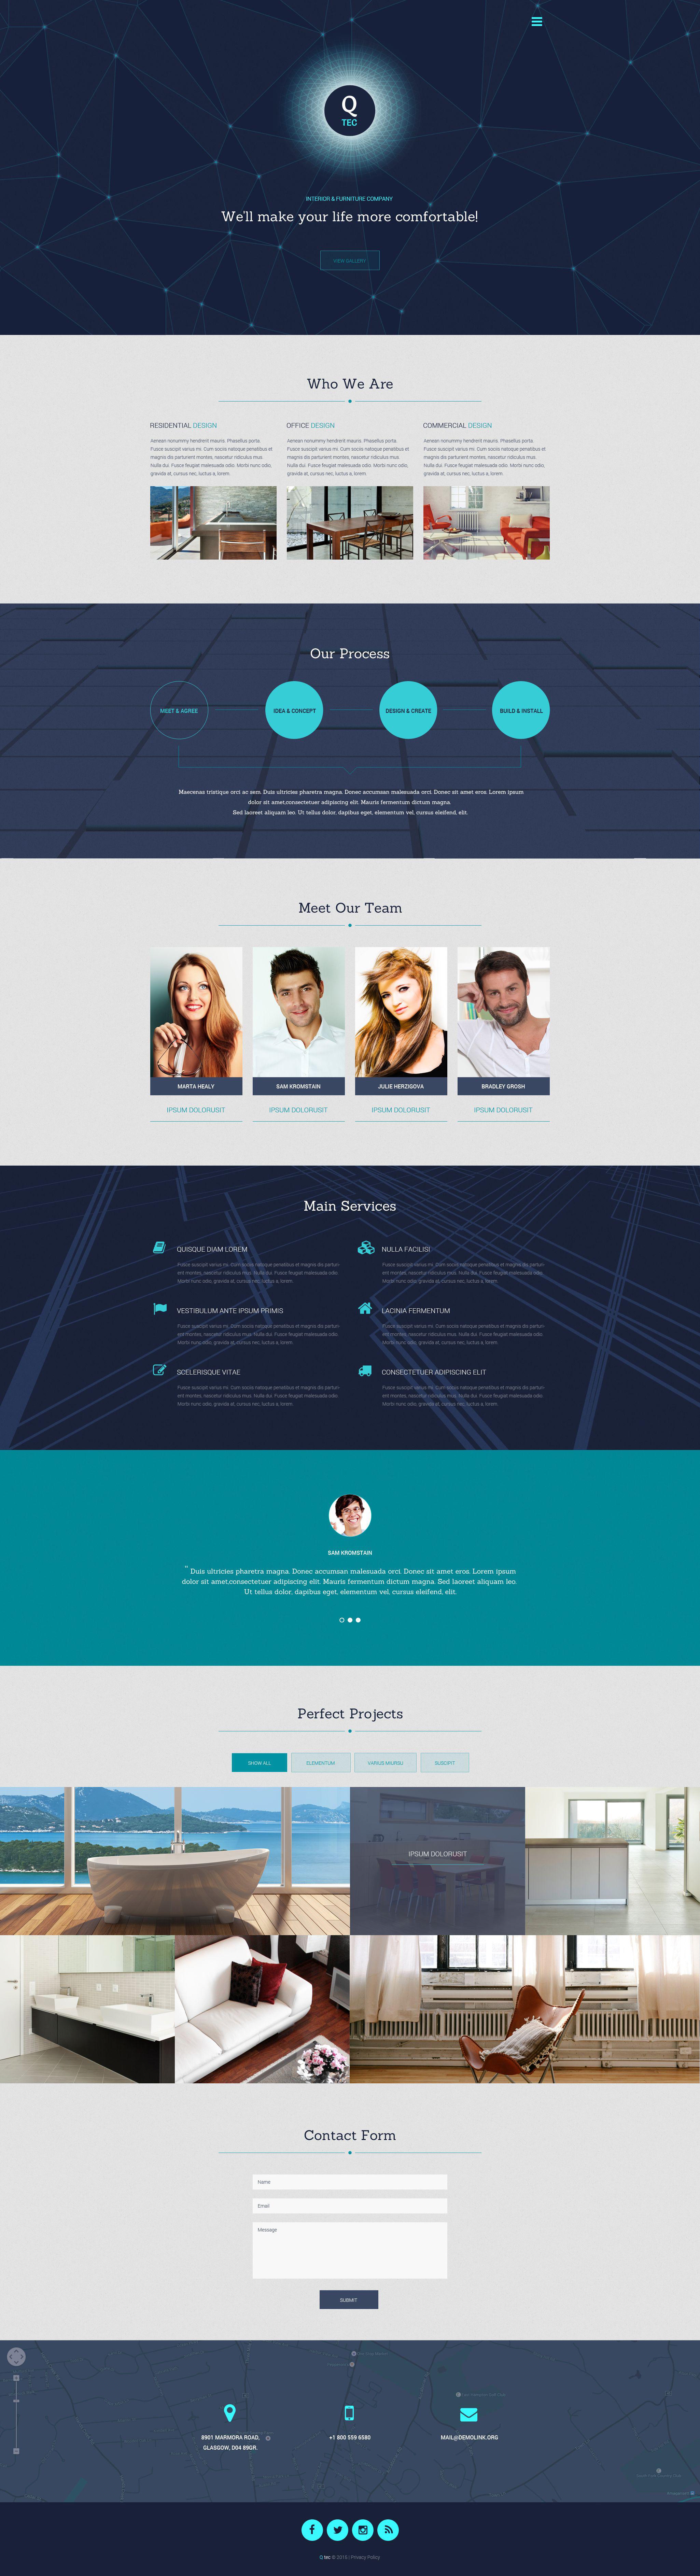 """Interior  Furniture"" modèle web adaptatif #55614 - screenshot"